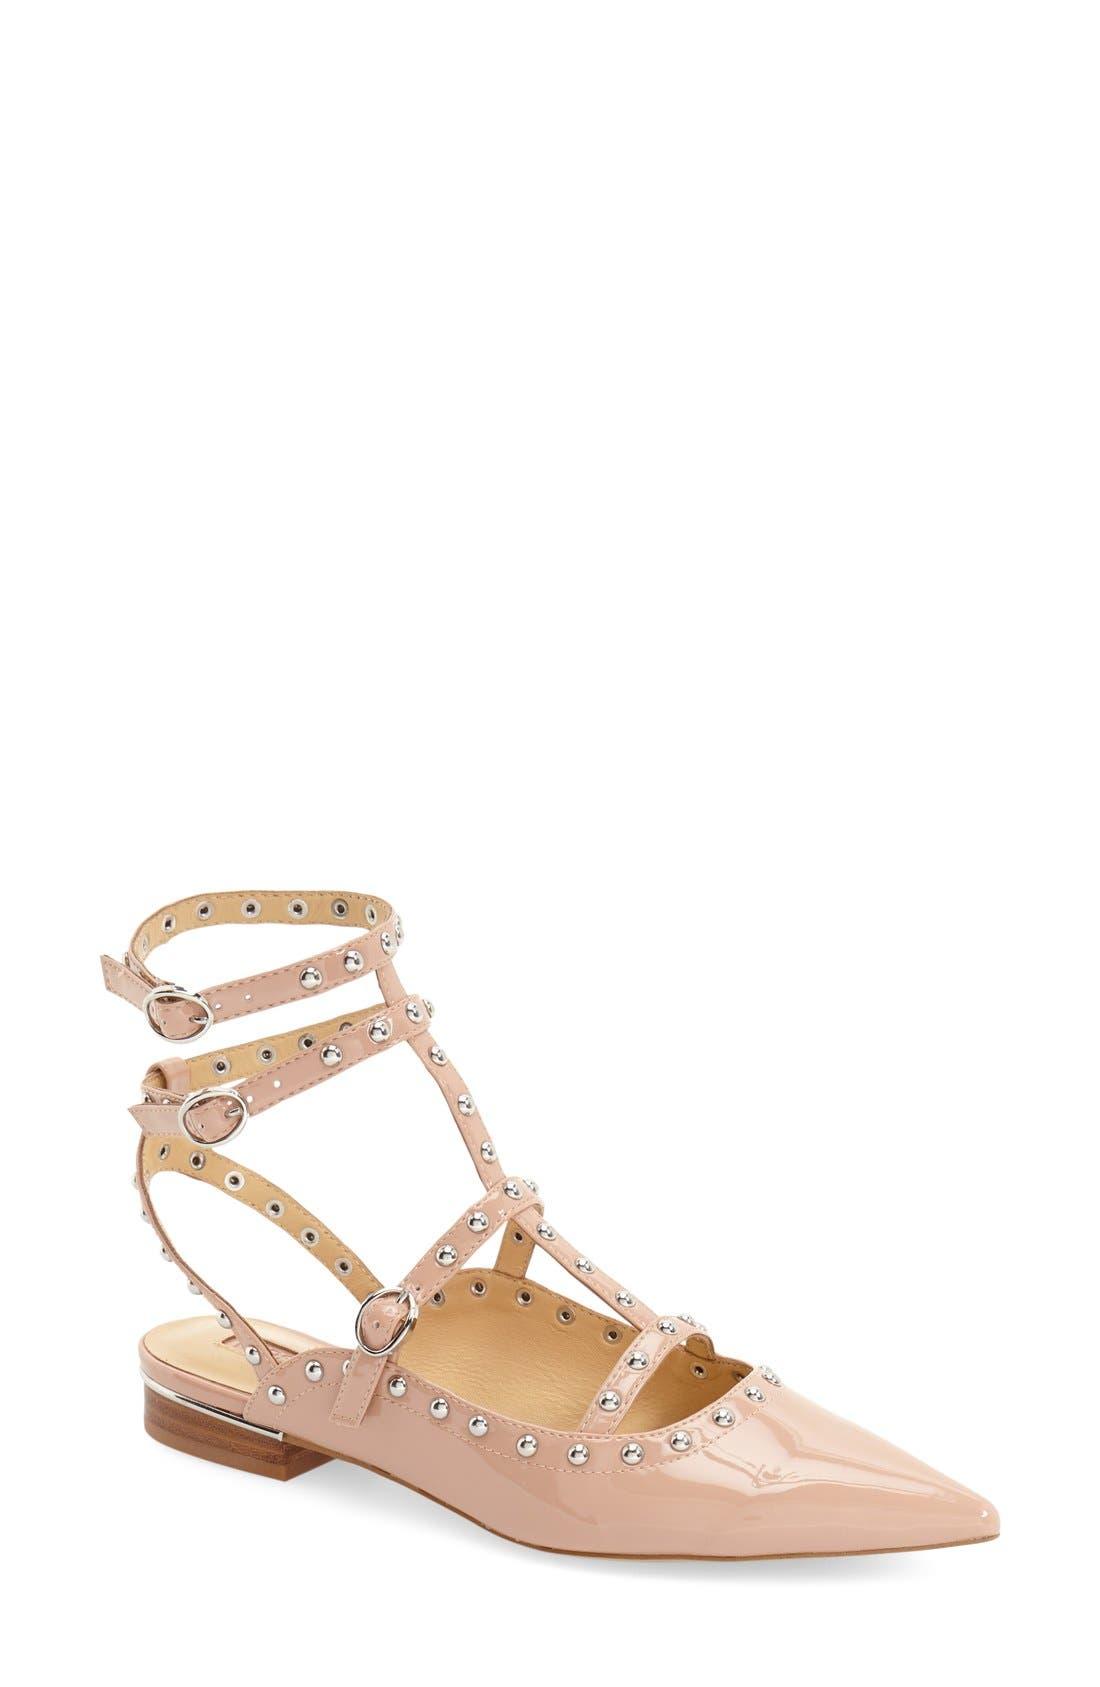 Main Image - Topshop 'Kate' Pointy Toe Flat (Women)